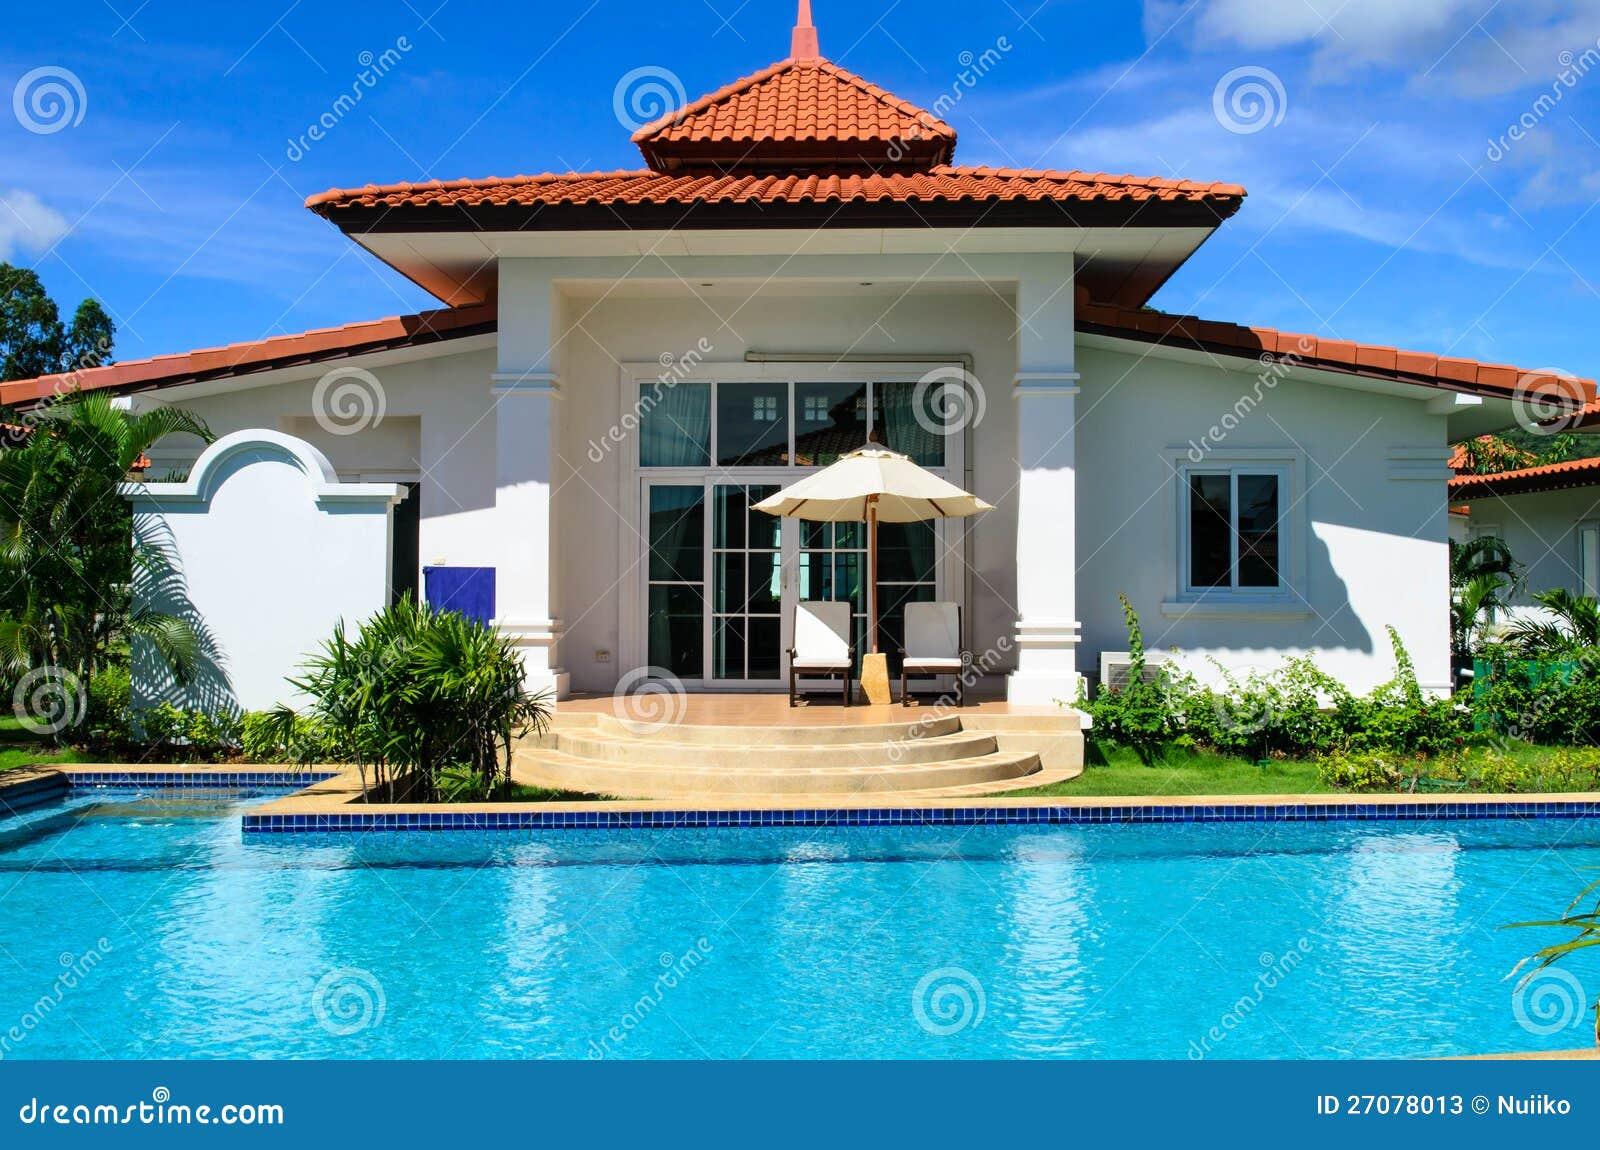 Dreams House With Pool Stock Image Image Of Neighborhood 27078013